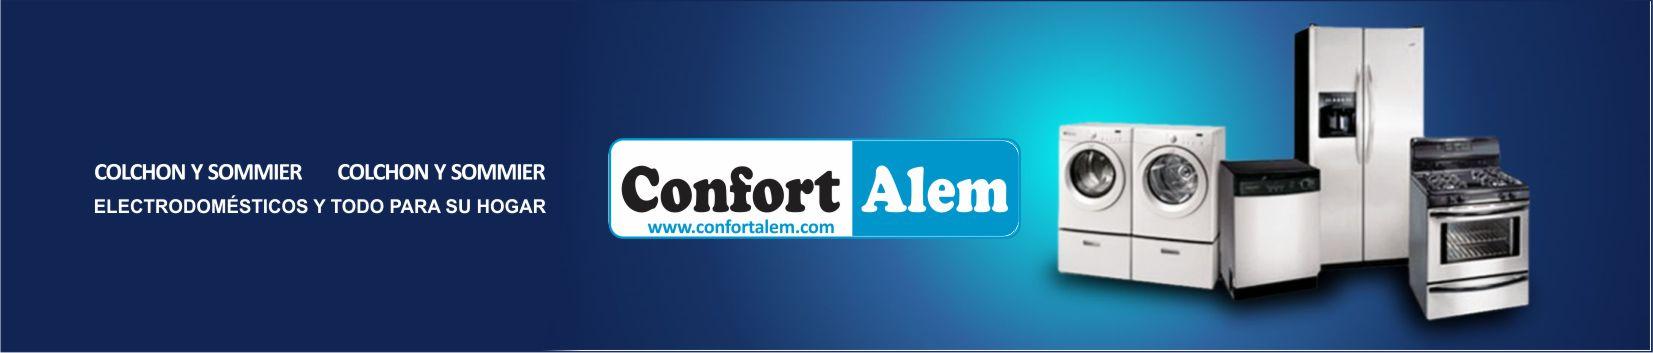 CONFORT ALEM